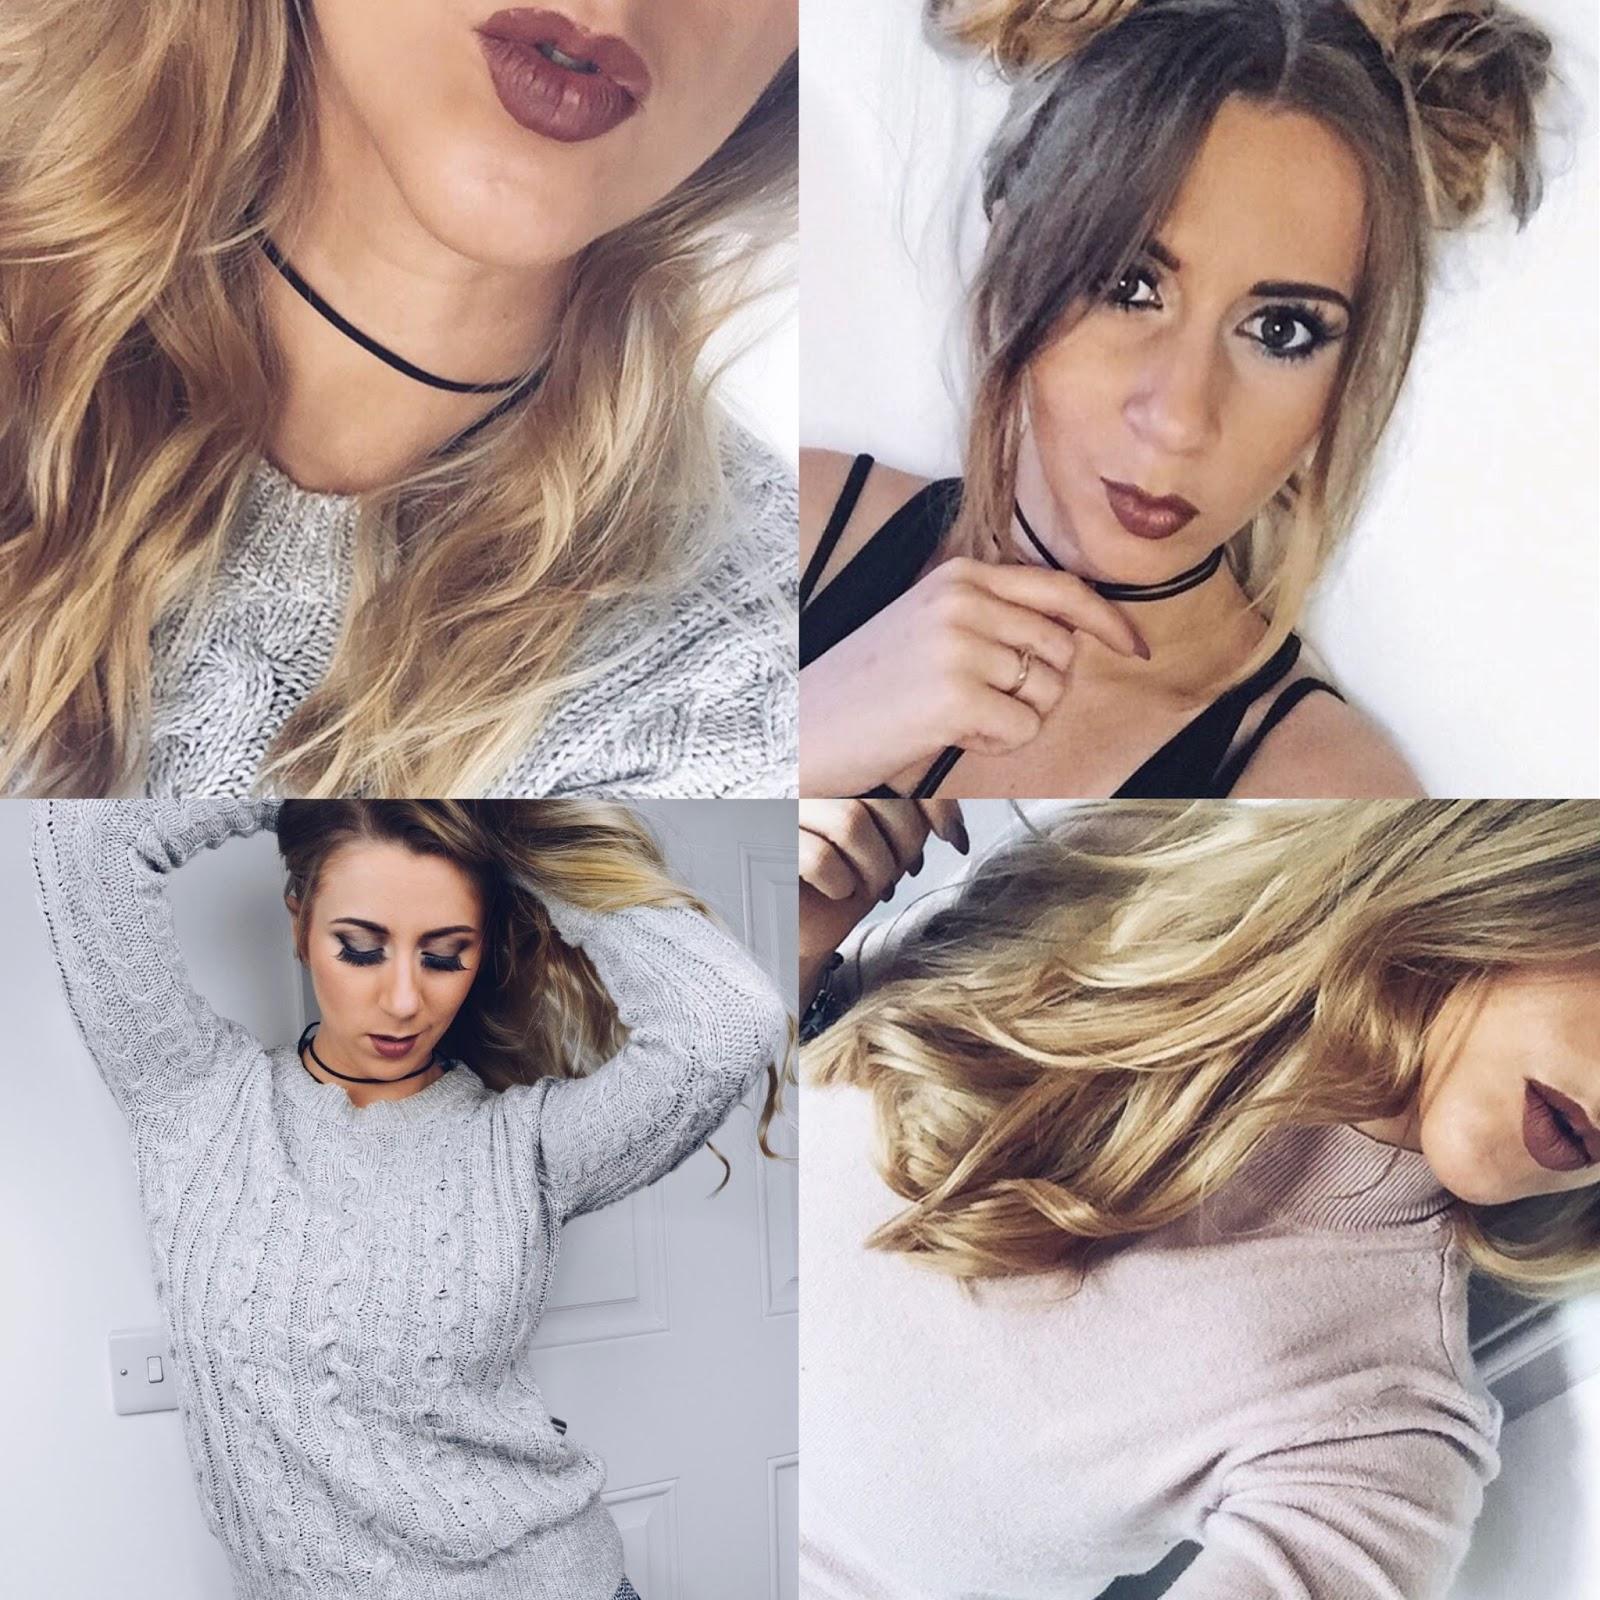 Lipstick, Nude Lip, NYX Cosmetics, NYX Liquid Suede, NYX Nude Lip, Primar Lip Liner, Beauty